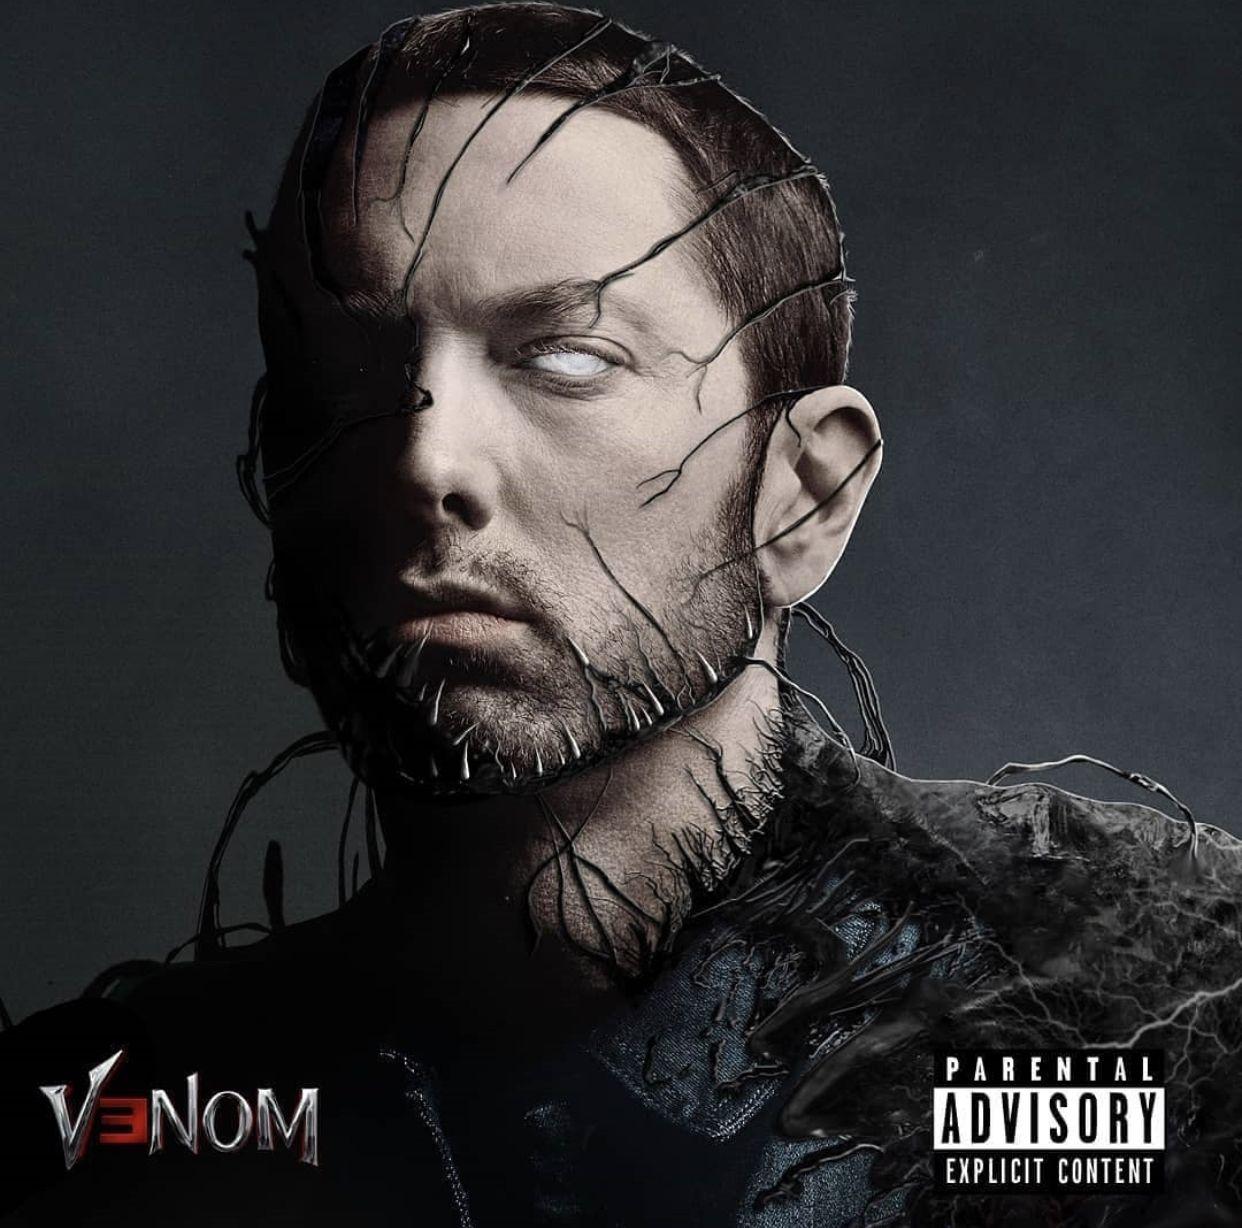 Pin by Jackie Trujillo on Eminem Eminem wallpapers